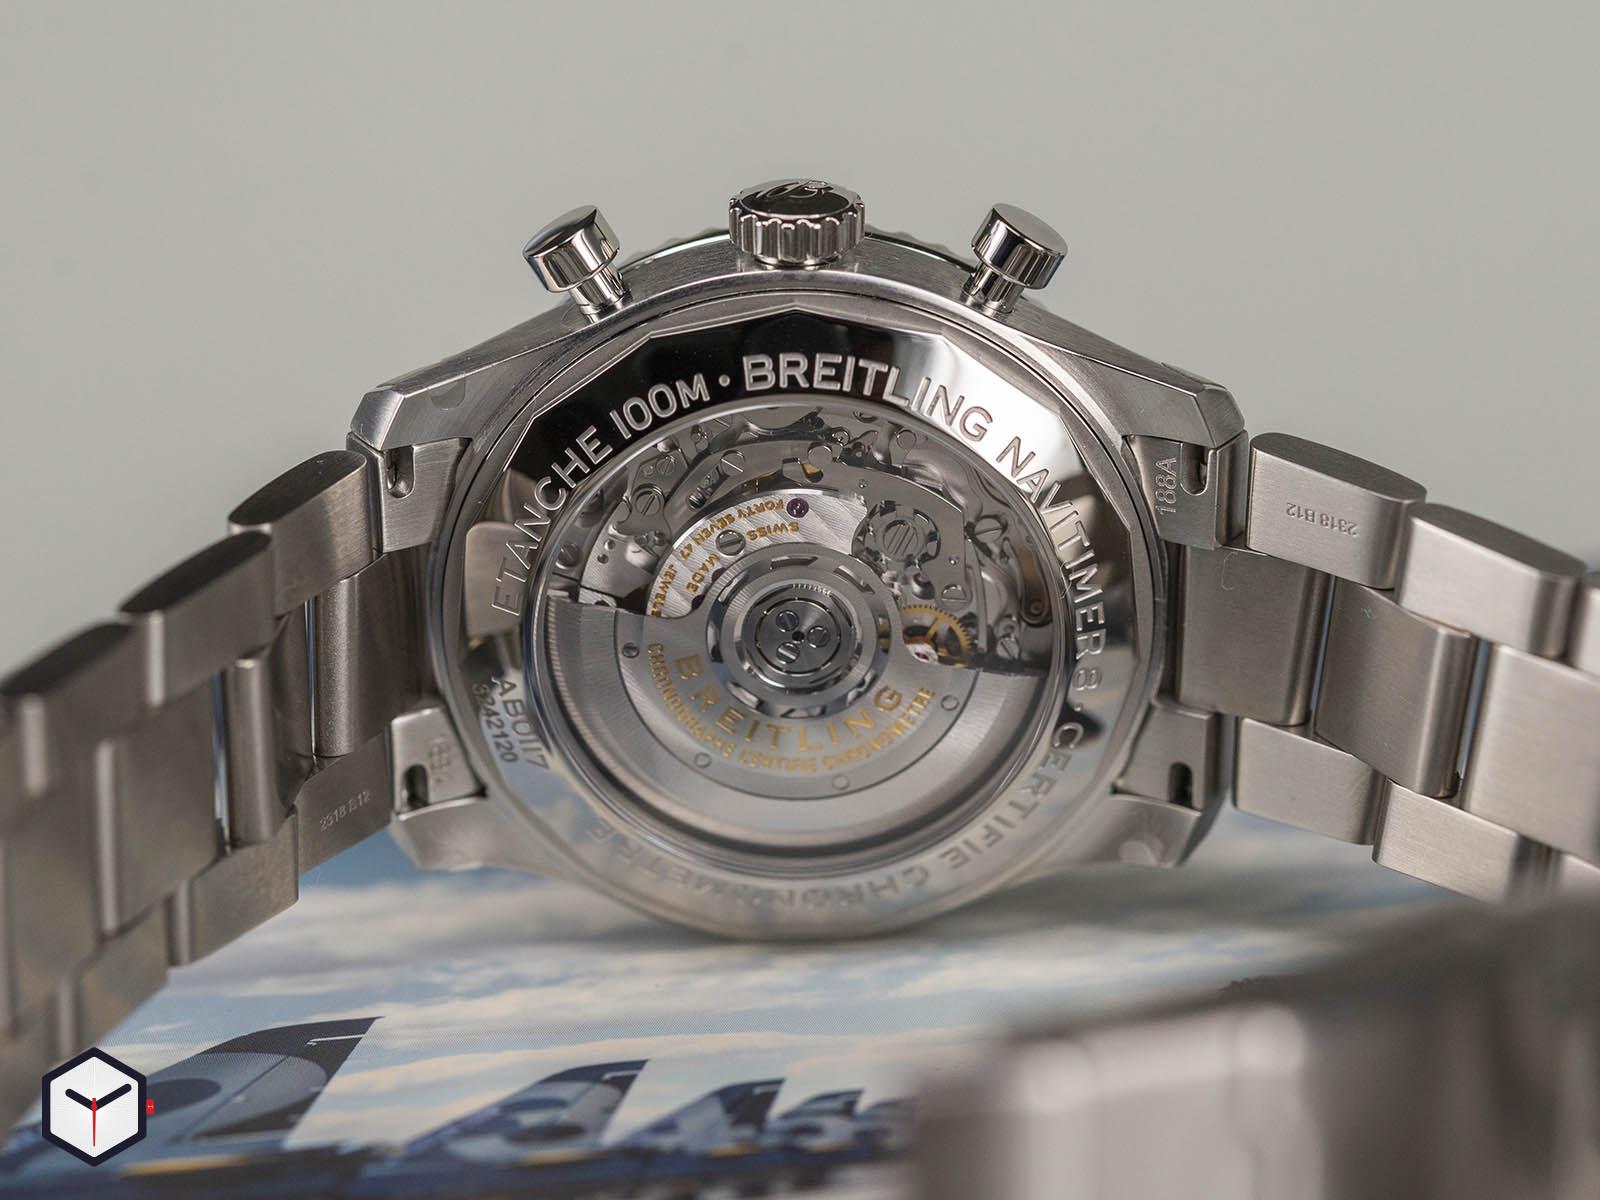 ab0117131b1a1-breitling-navitimer-8-b01-chronograph-6.jpg